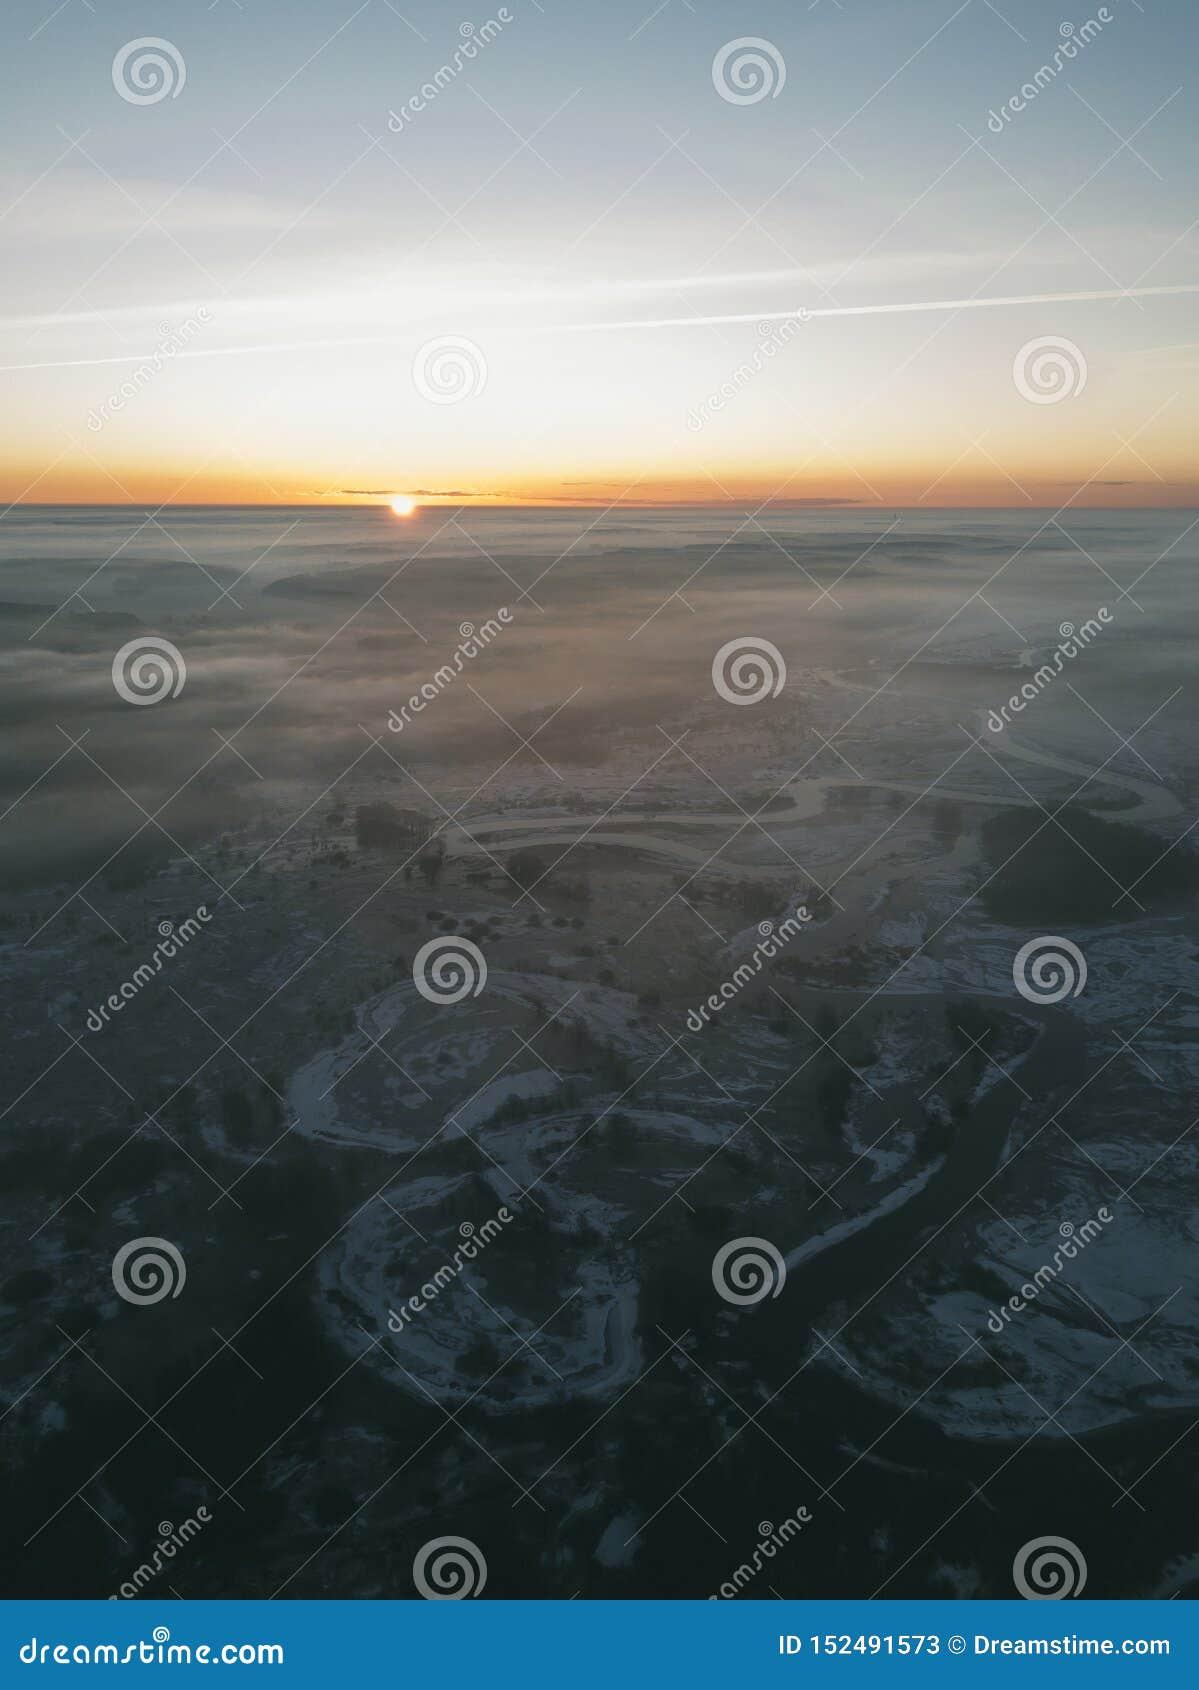 Dämmerung über dem gefrorenen Fluss, Nebel zwischen den Bäumen, Bündel Nebel